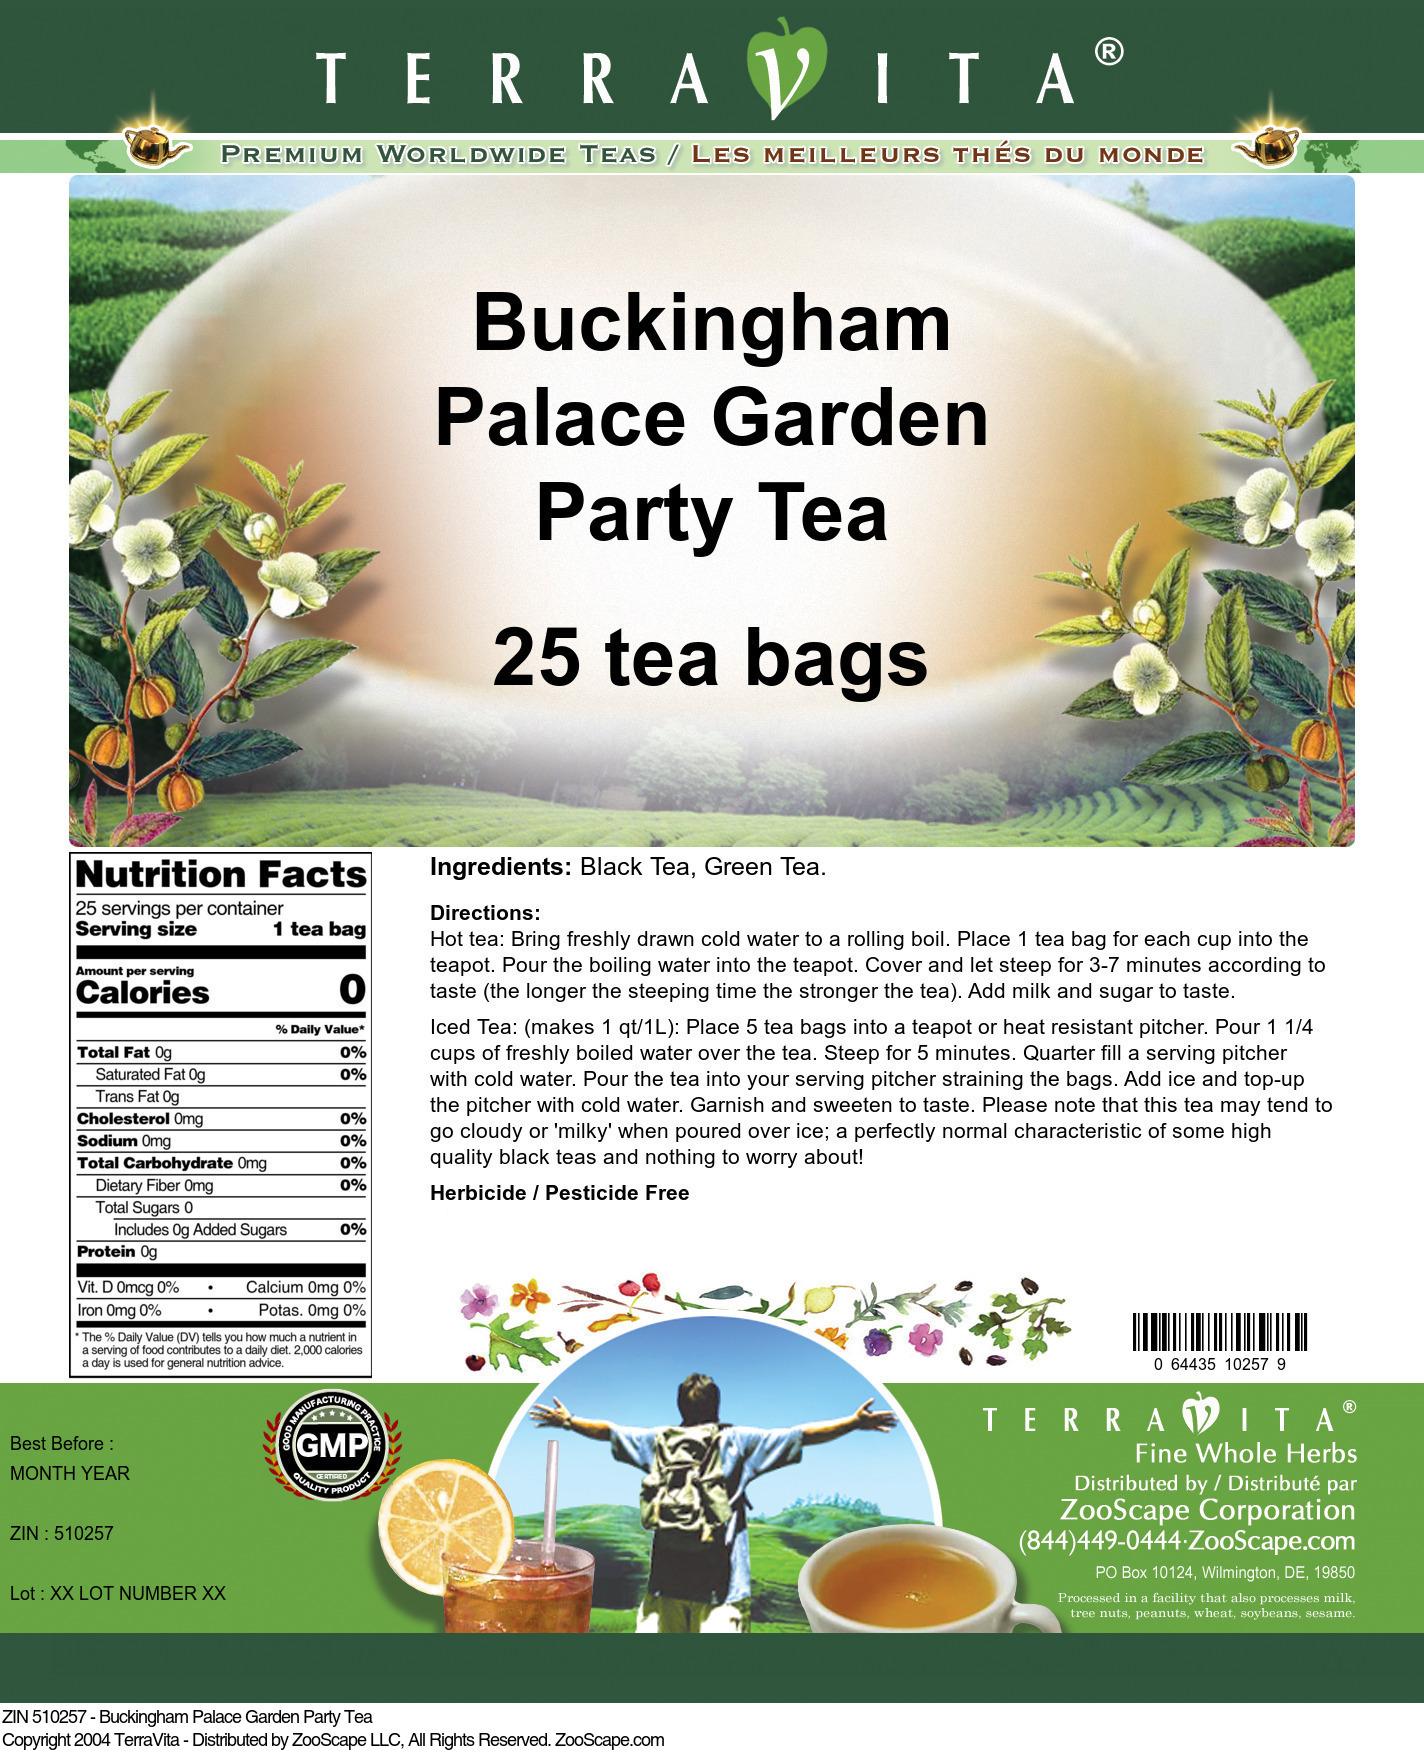 Buckingham Palace Garden Party Tea